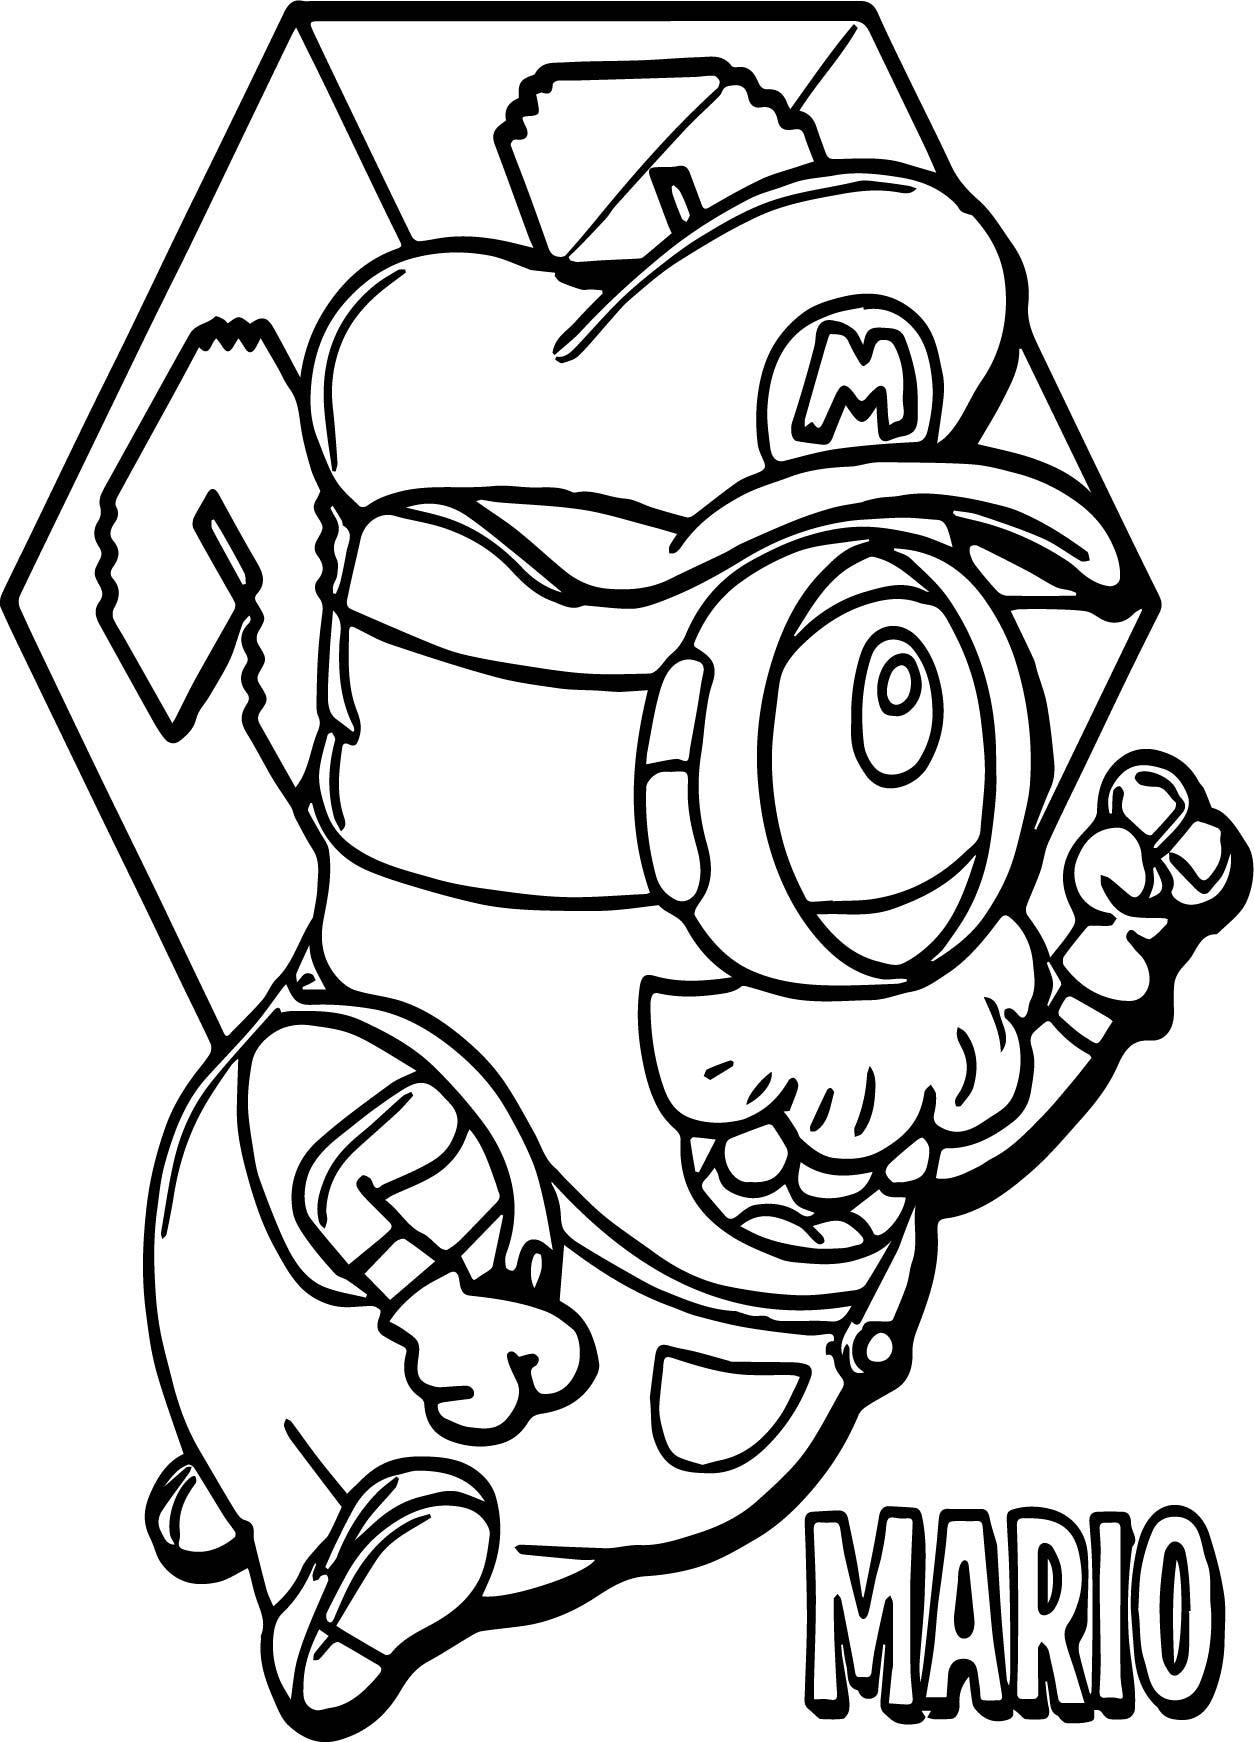 Super Mario Minion Coloring Page Free Printable Coloring